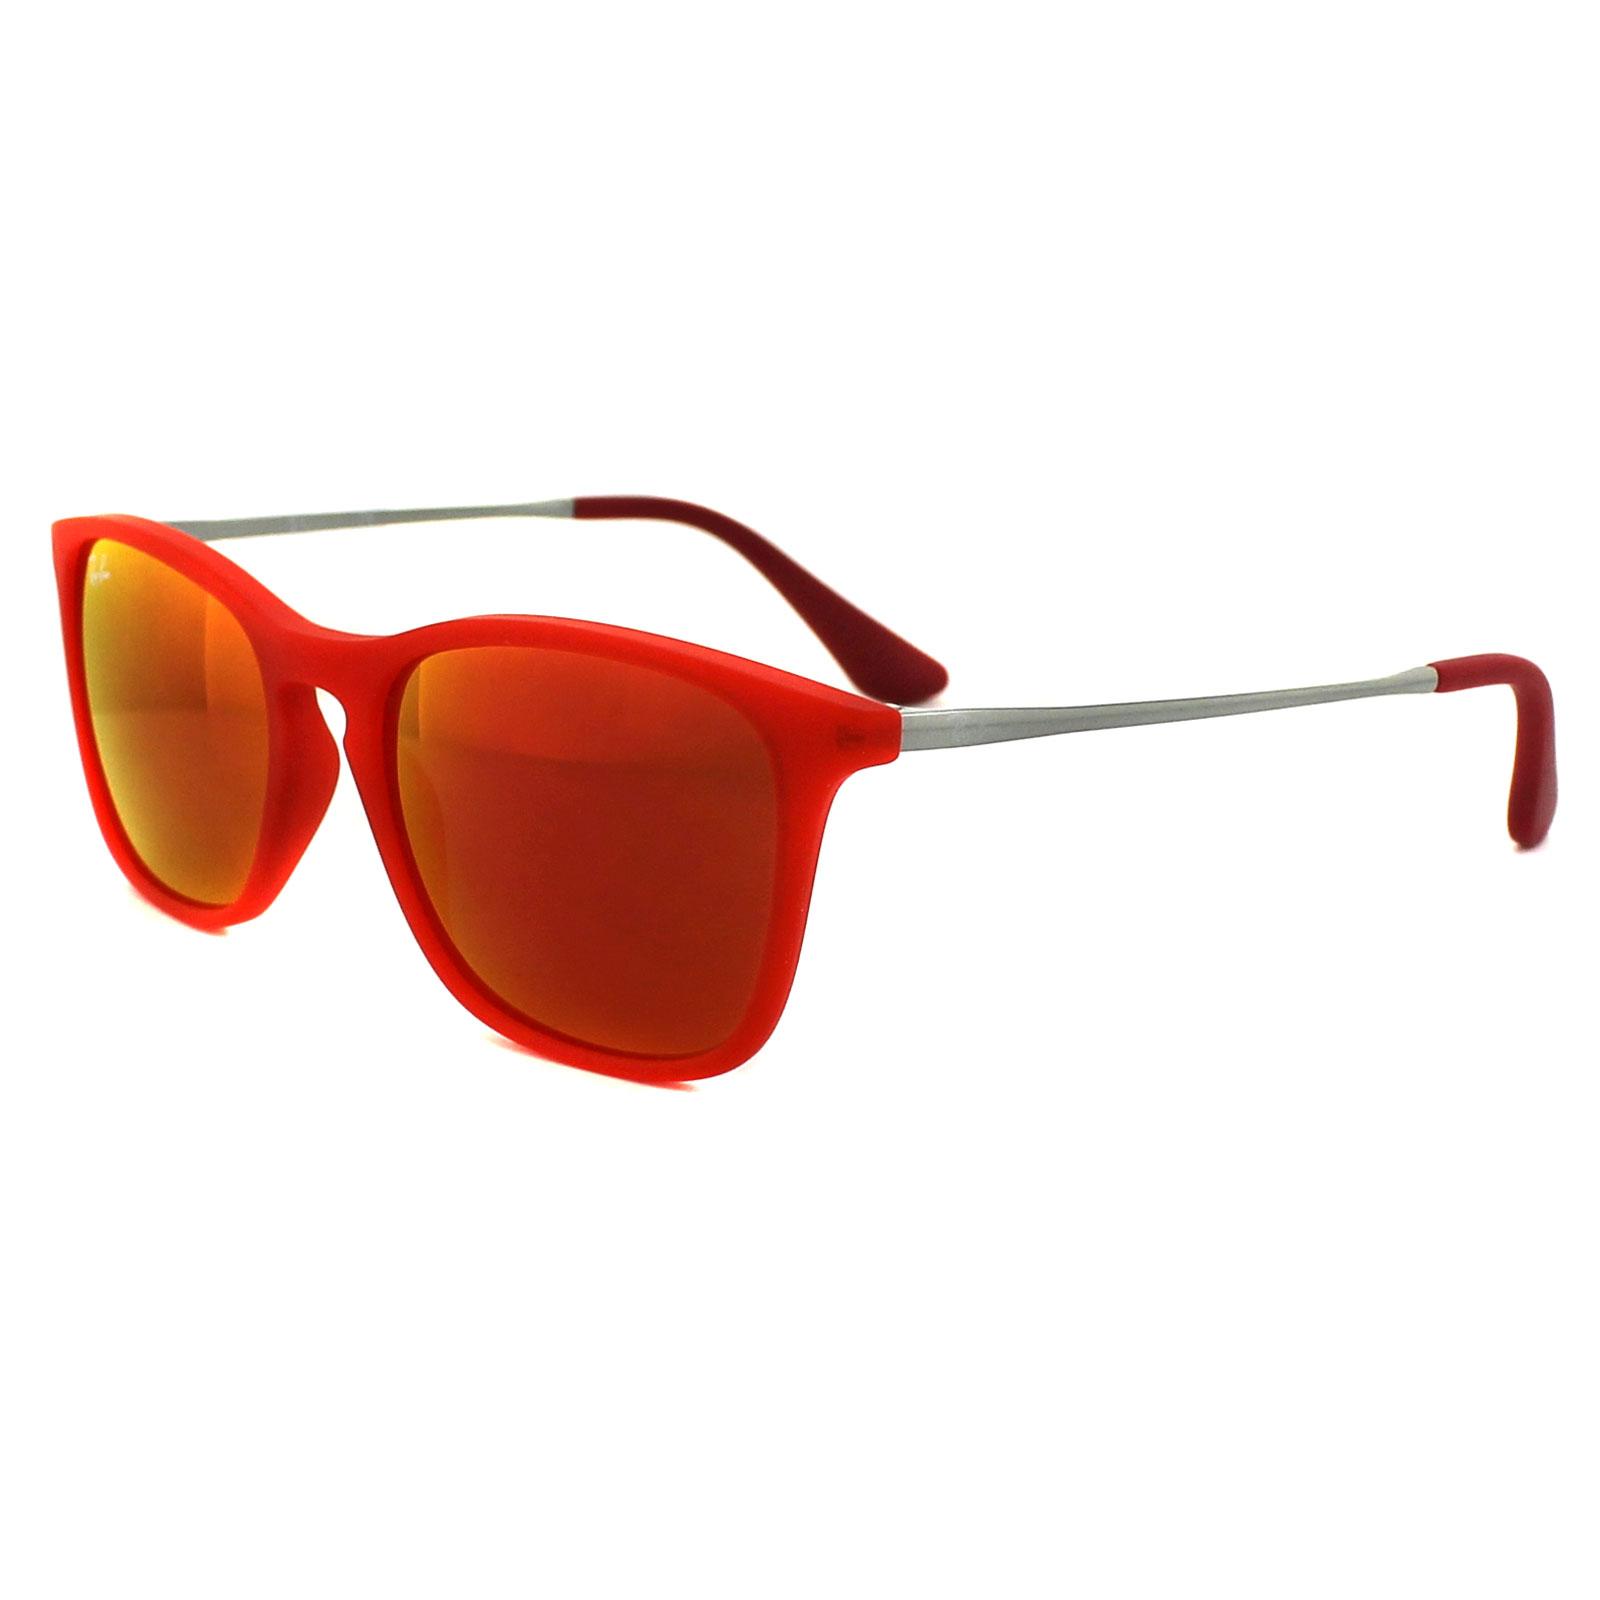 d86c6a1111f55 Cheap Ray-Ban Junior Chris Junior 9061 Sunglasses - Discounted ...